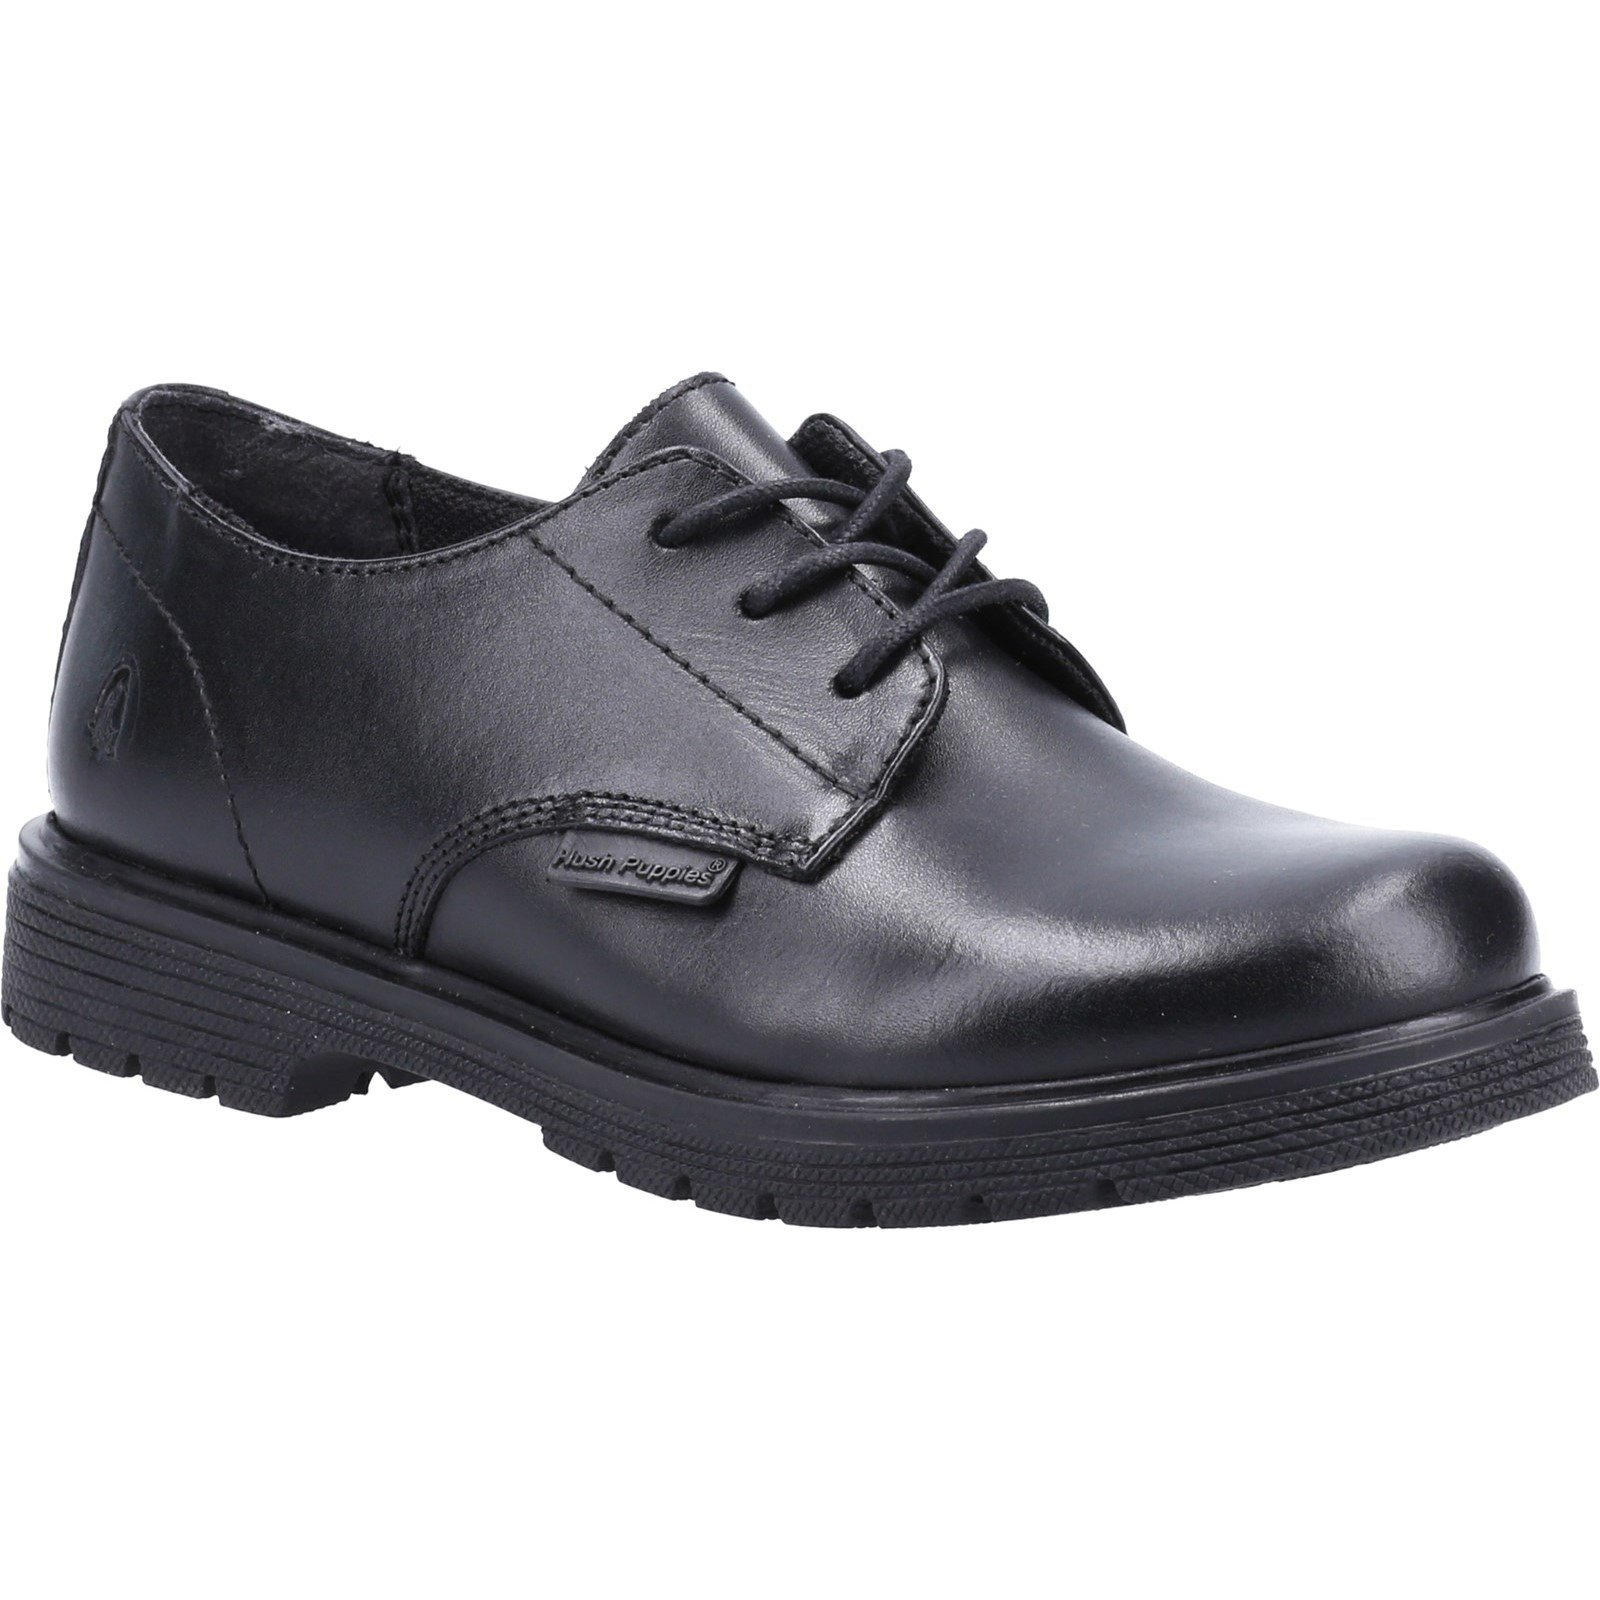 Hush Puppies Kid's Remi Senior School Derby Shoe Black 32613 - Black 5